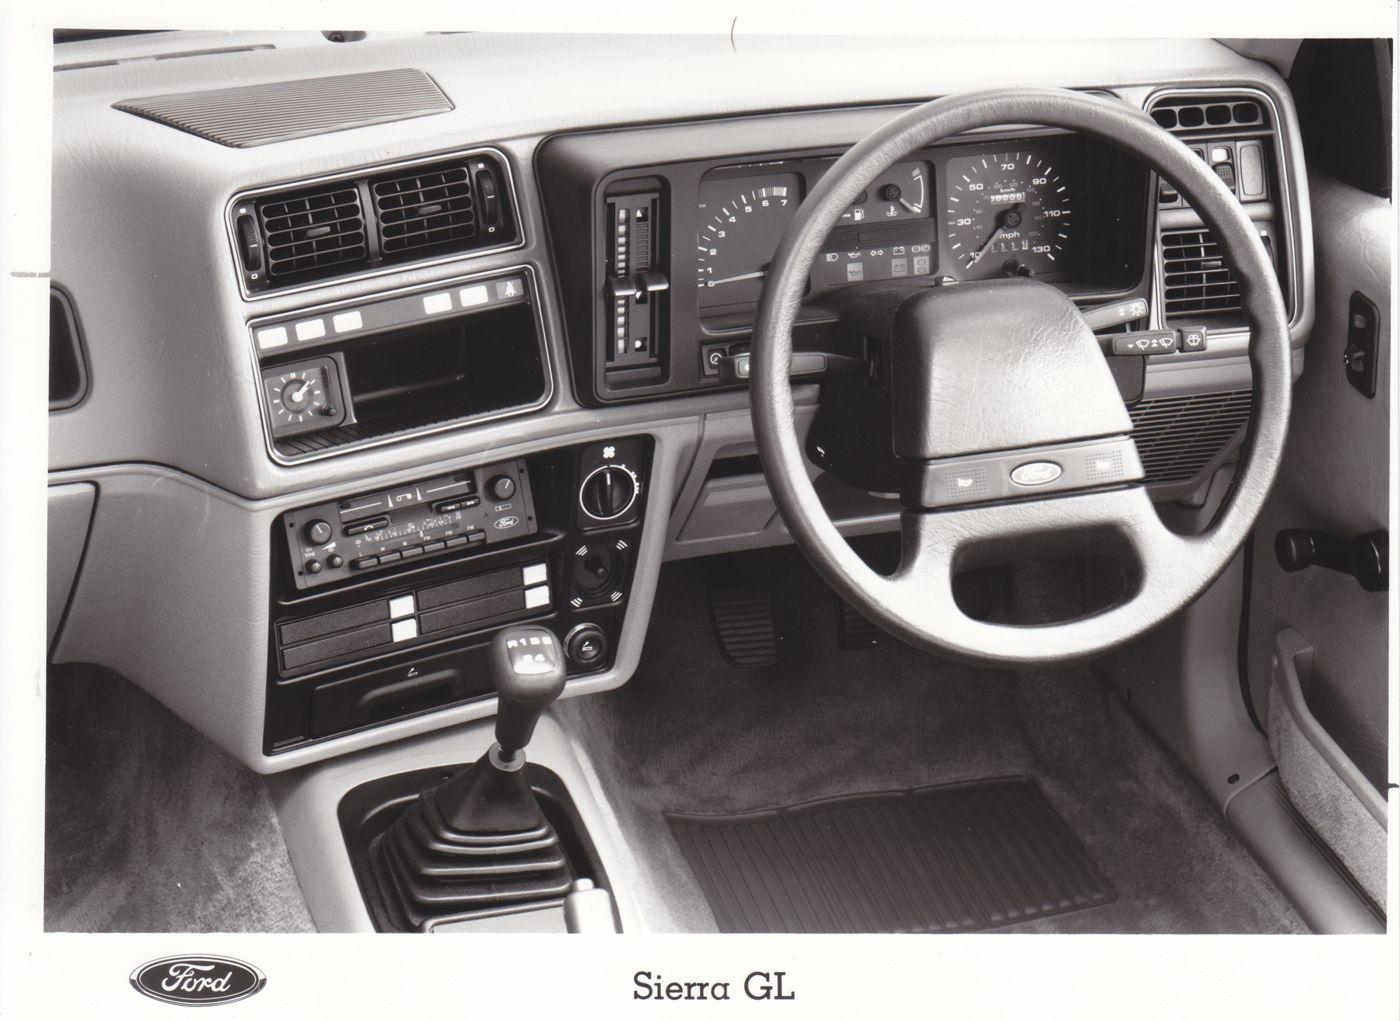 Ford Sierra Gl Dashboard Uk 1985 Factory Press Photo Ford